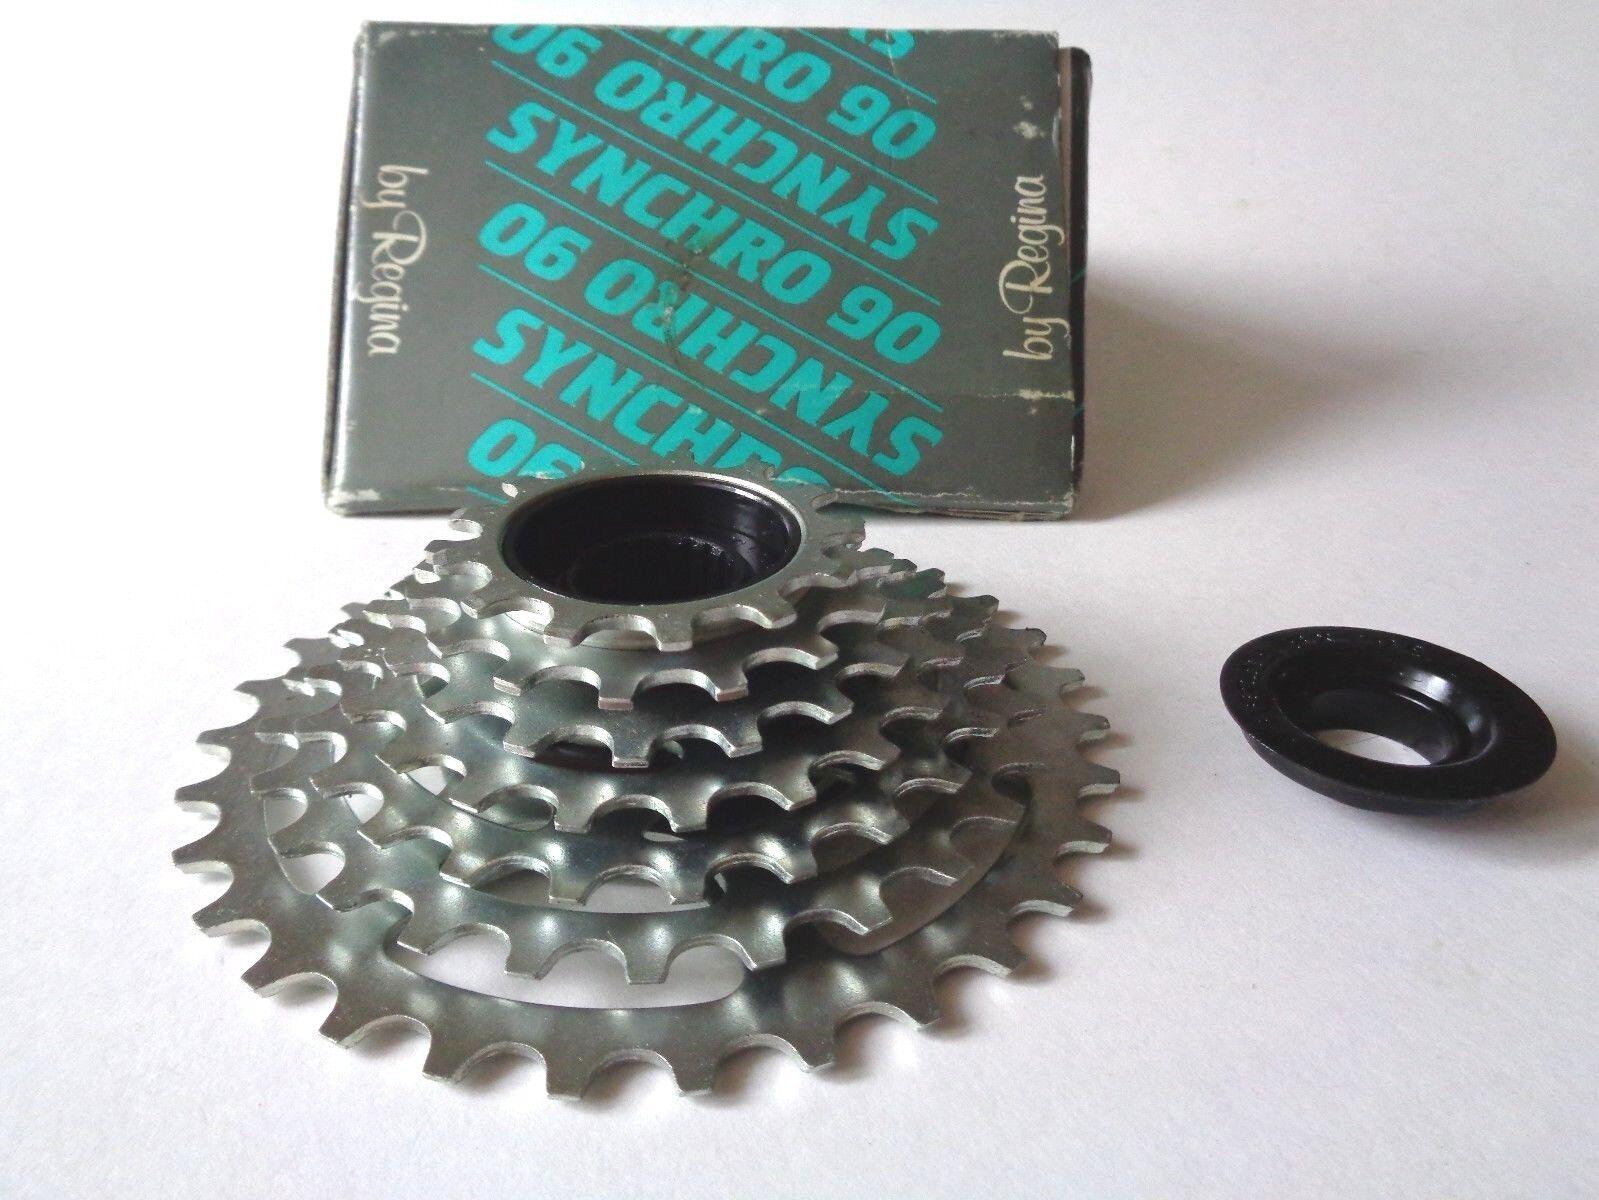 NOS Vintage 1980s REGINA SYNCHRO 90 13-31 cogs 7 Speed ISO freewheel cassette